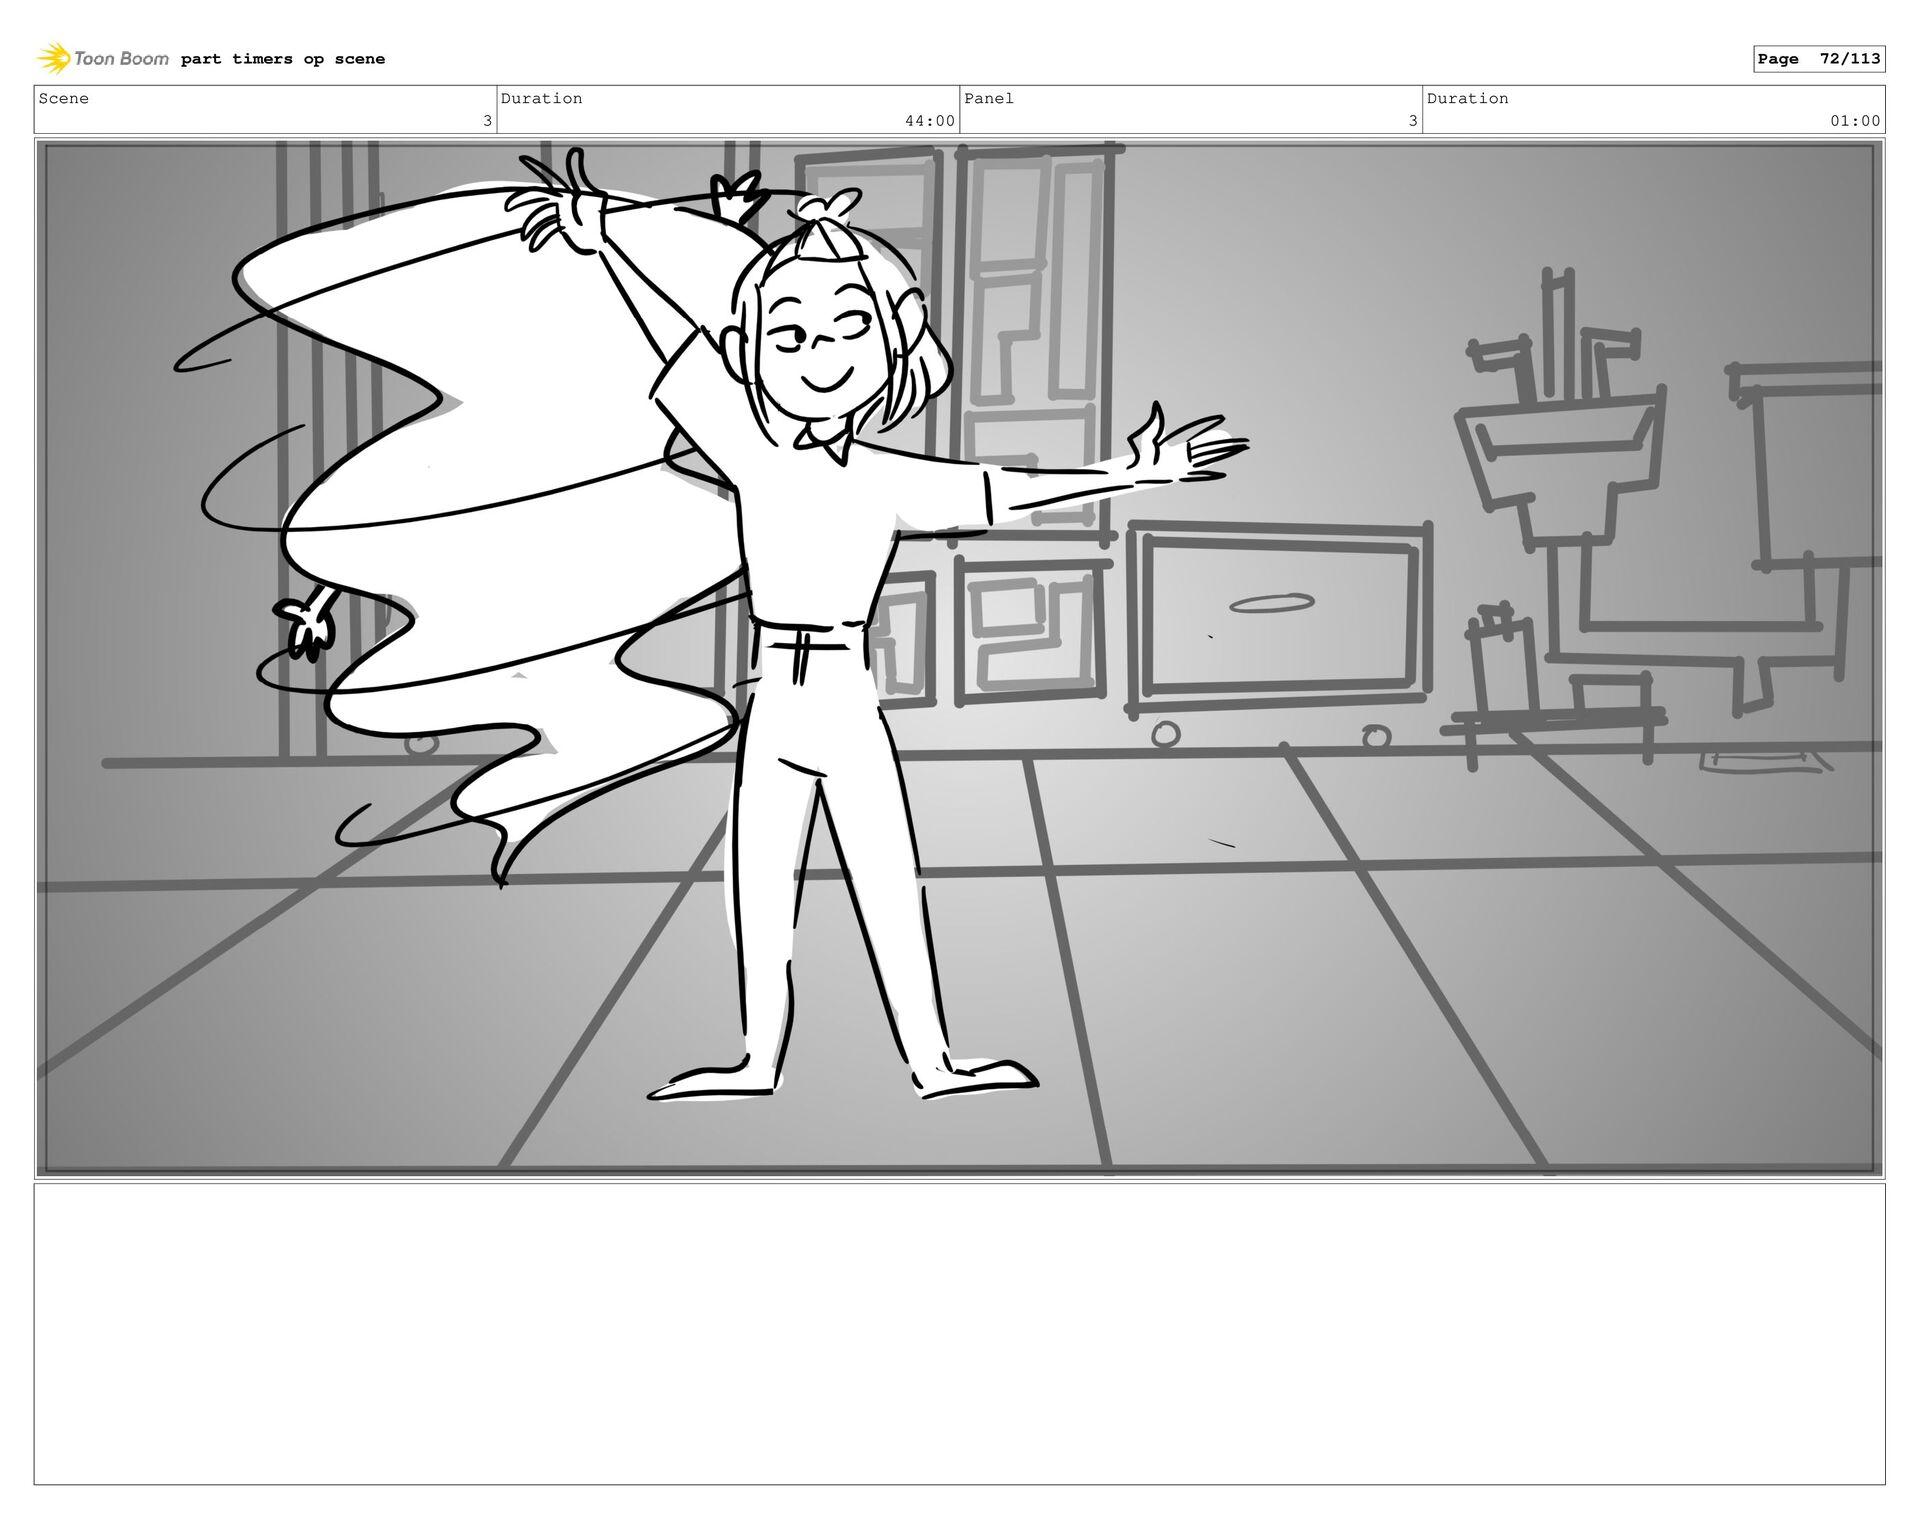 Scene 3 Duration 44:00 Panel 40 Duration 01:00 ...